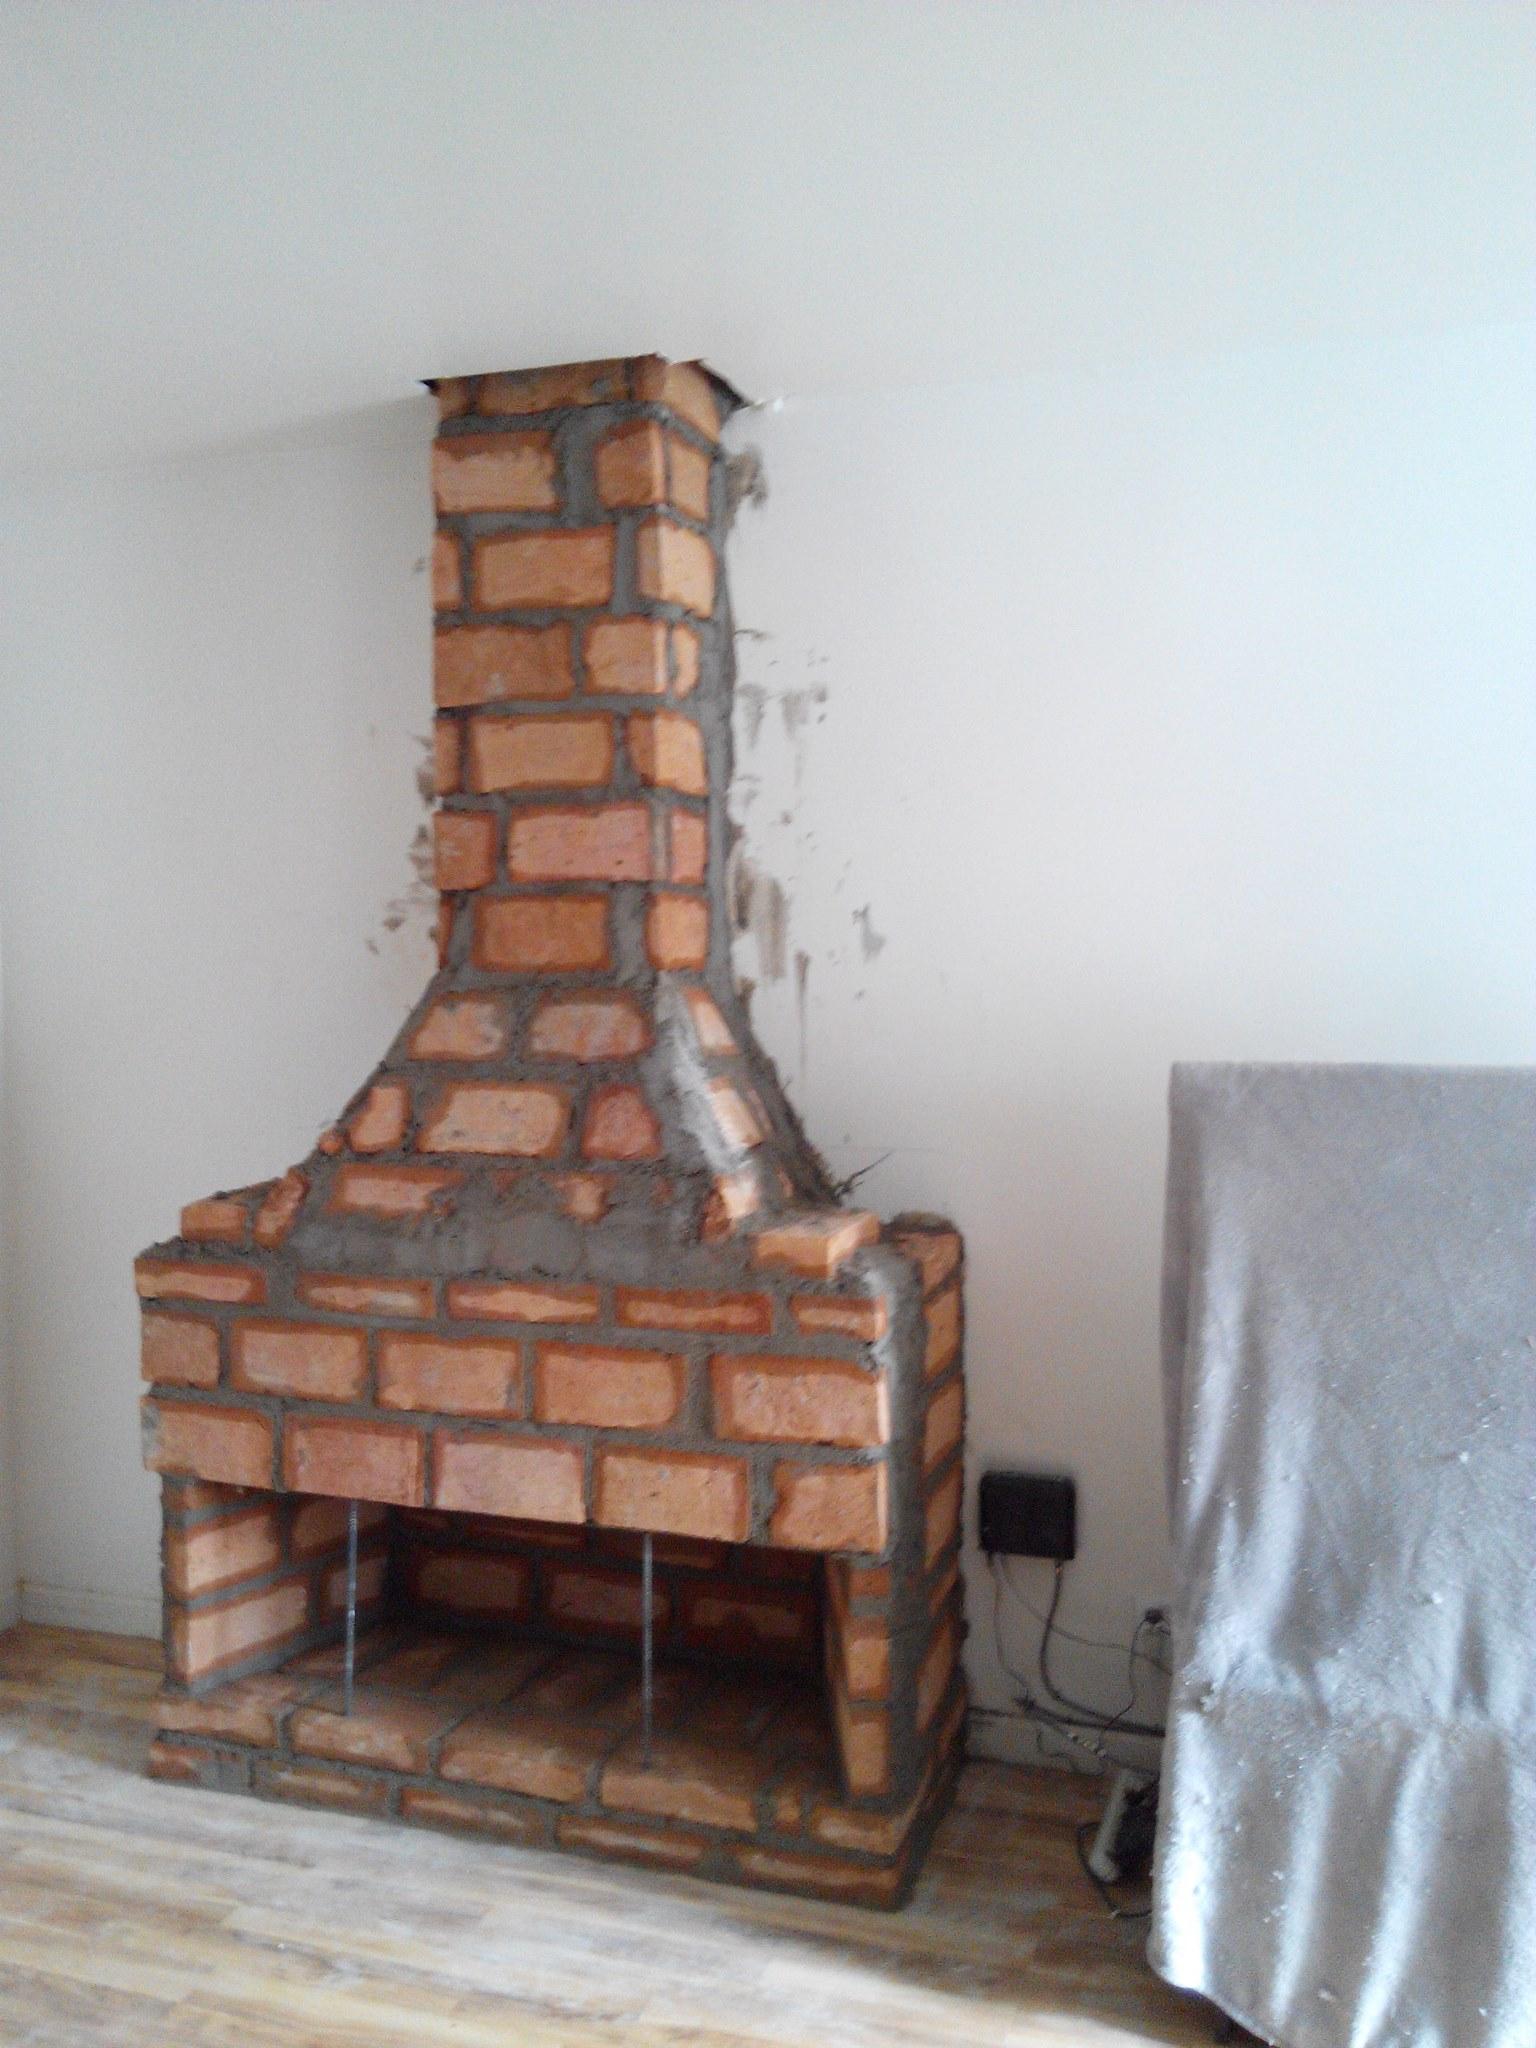 Chimeneas baja p gina 6 - Como hacer una chimenea de obra ...